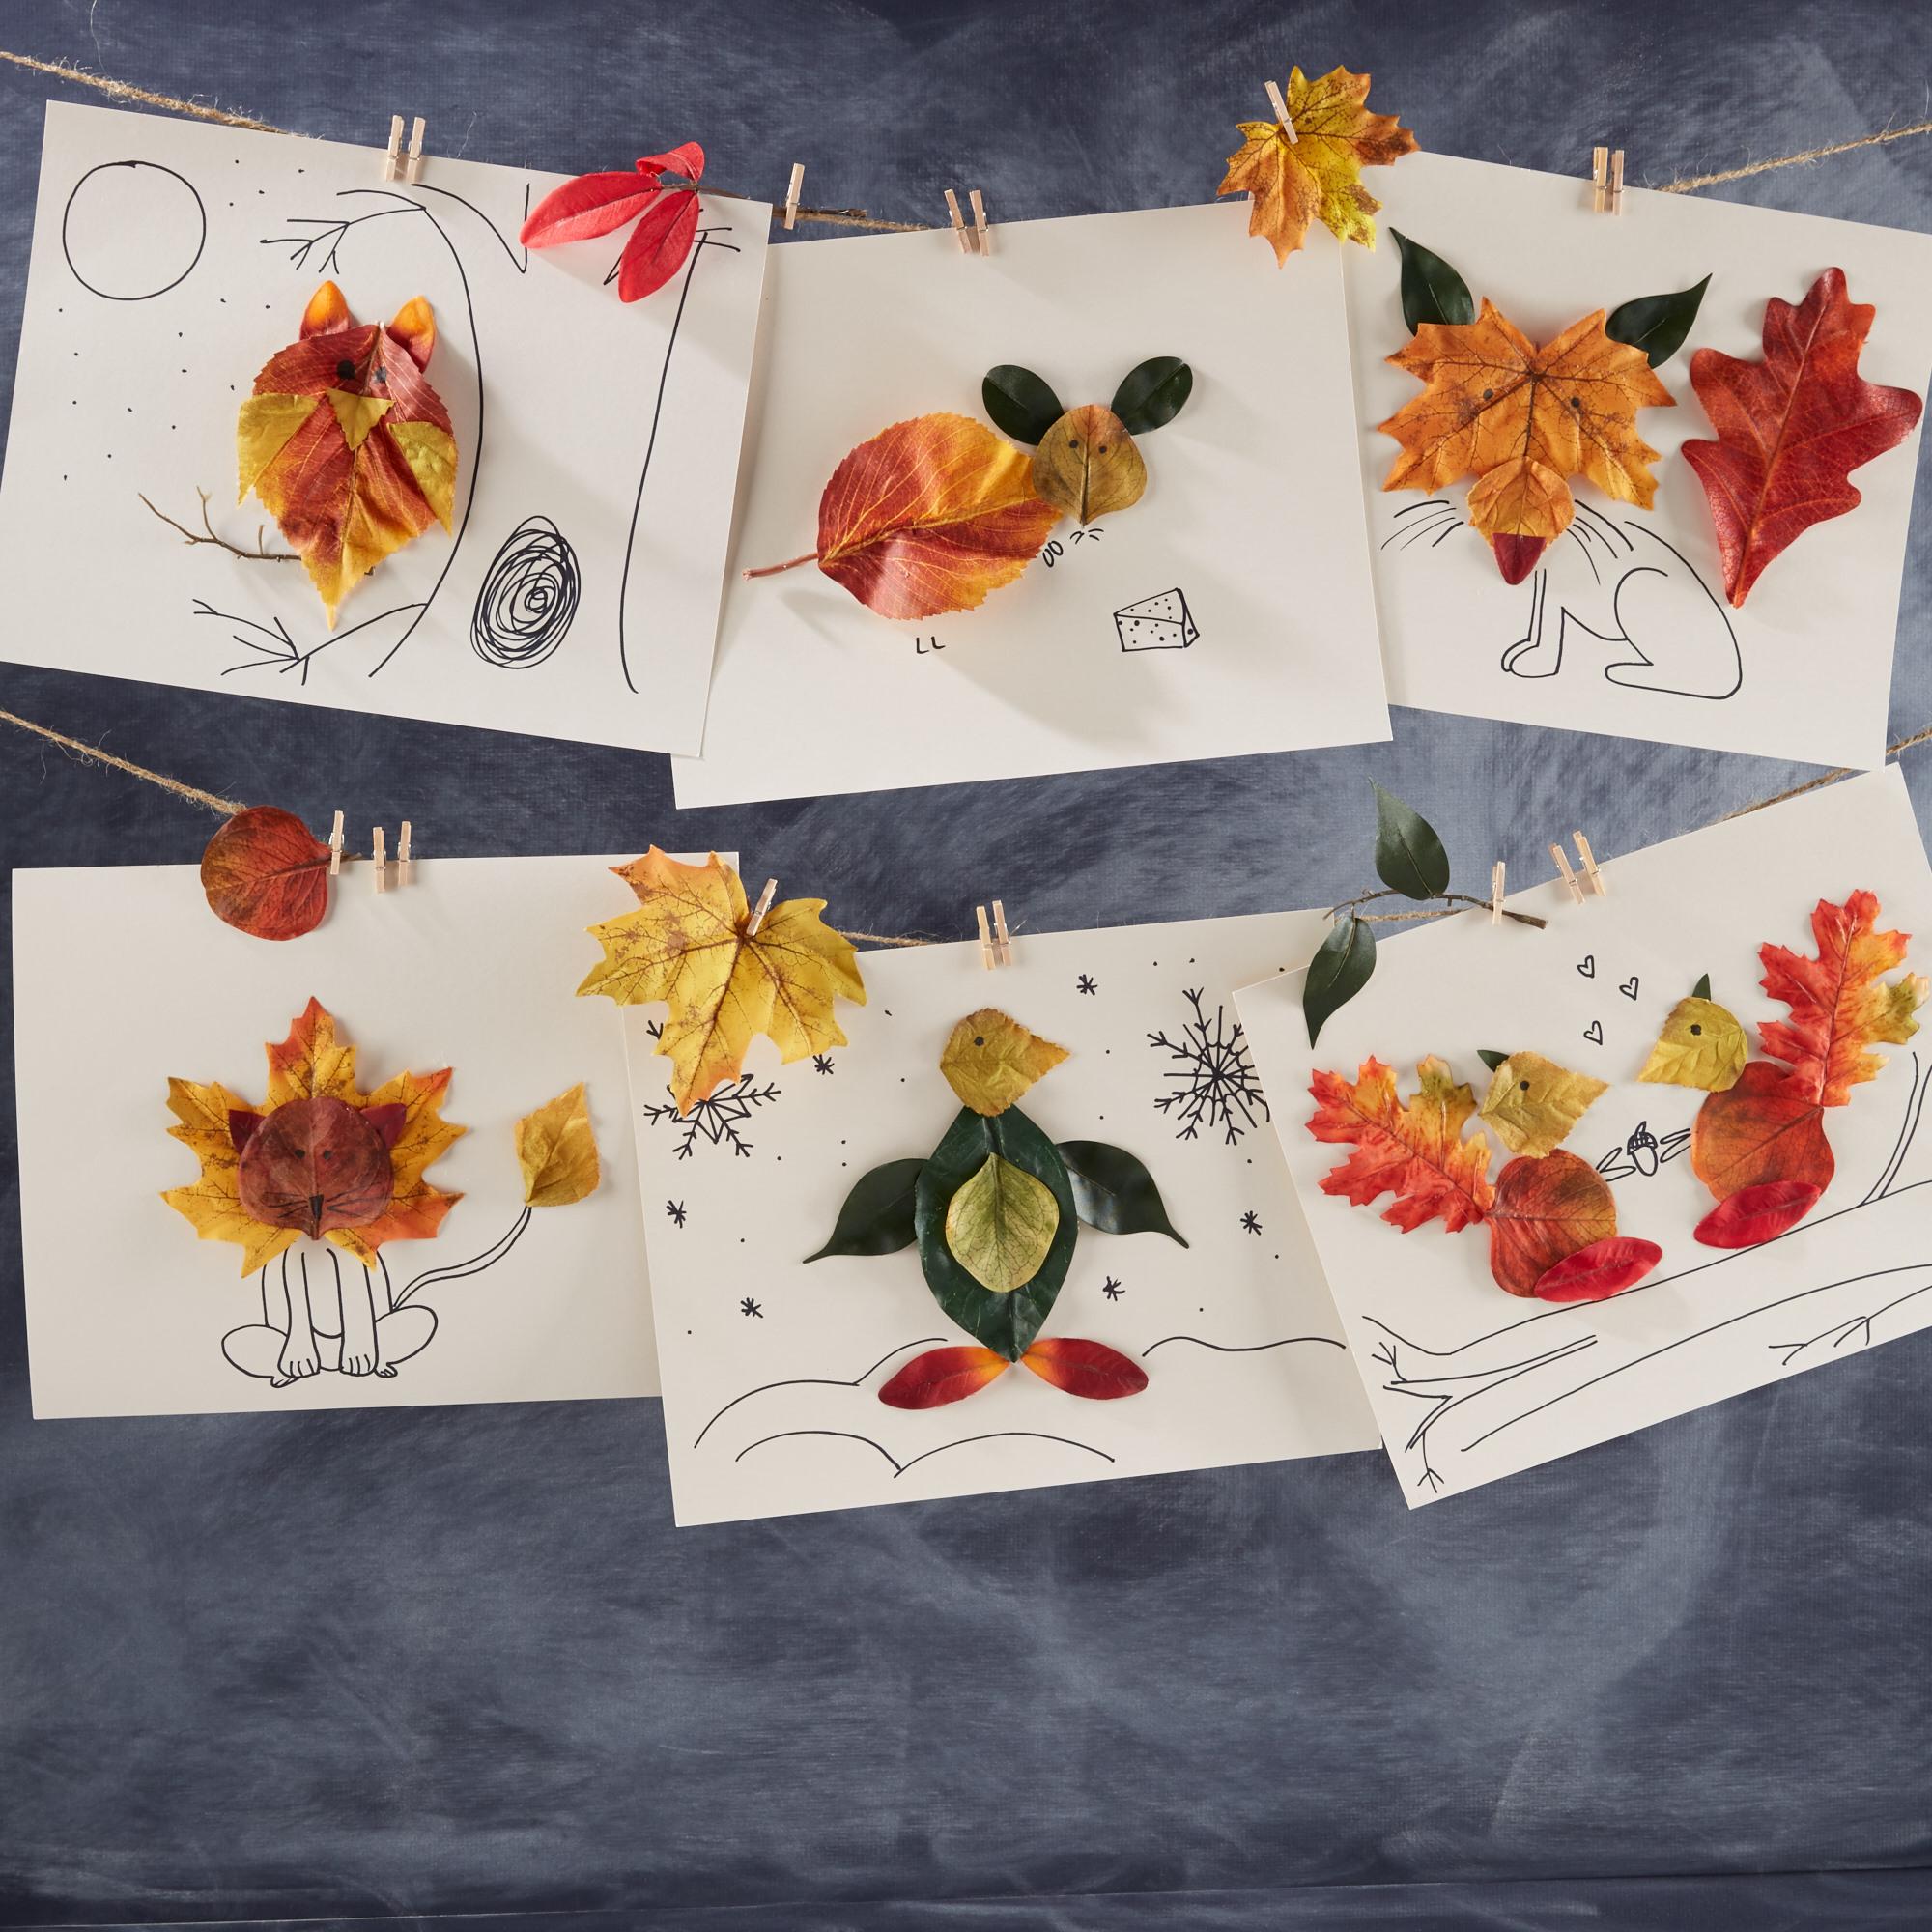 Fun with Fall Leaves  for  Oshkosh B'Gosh |  Steve Pomberg